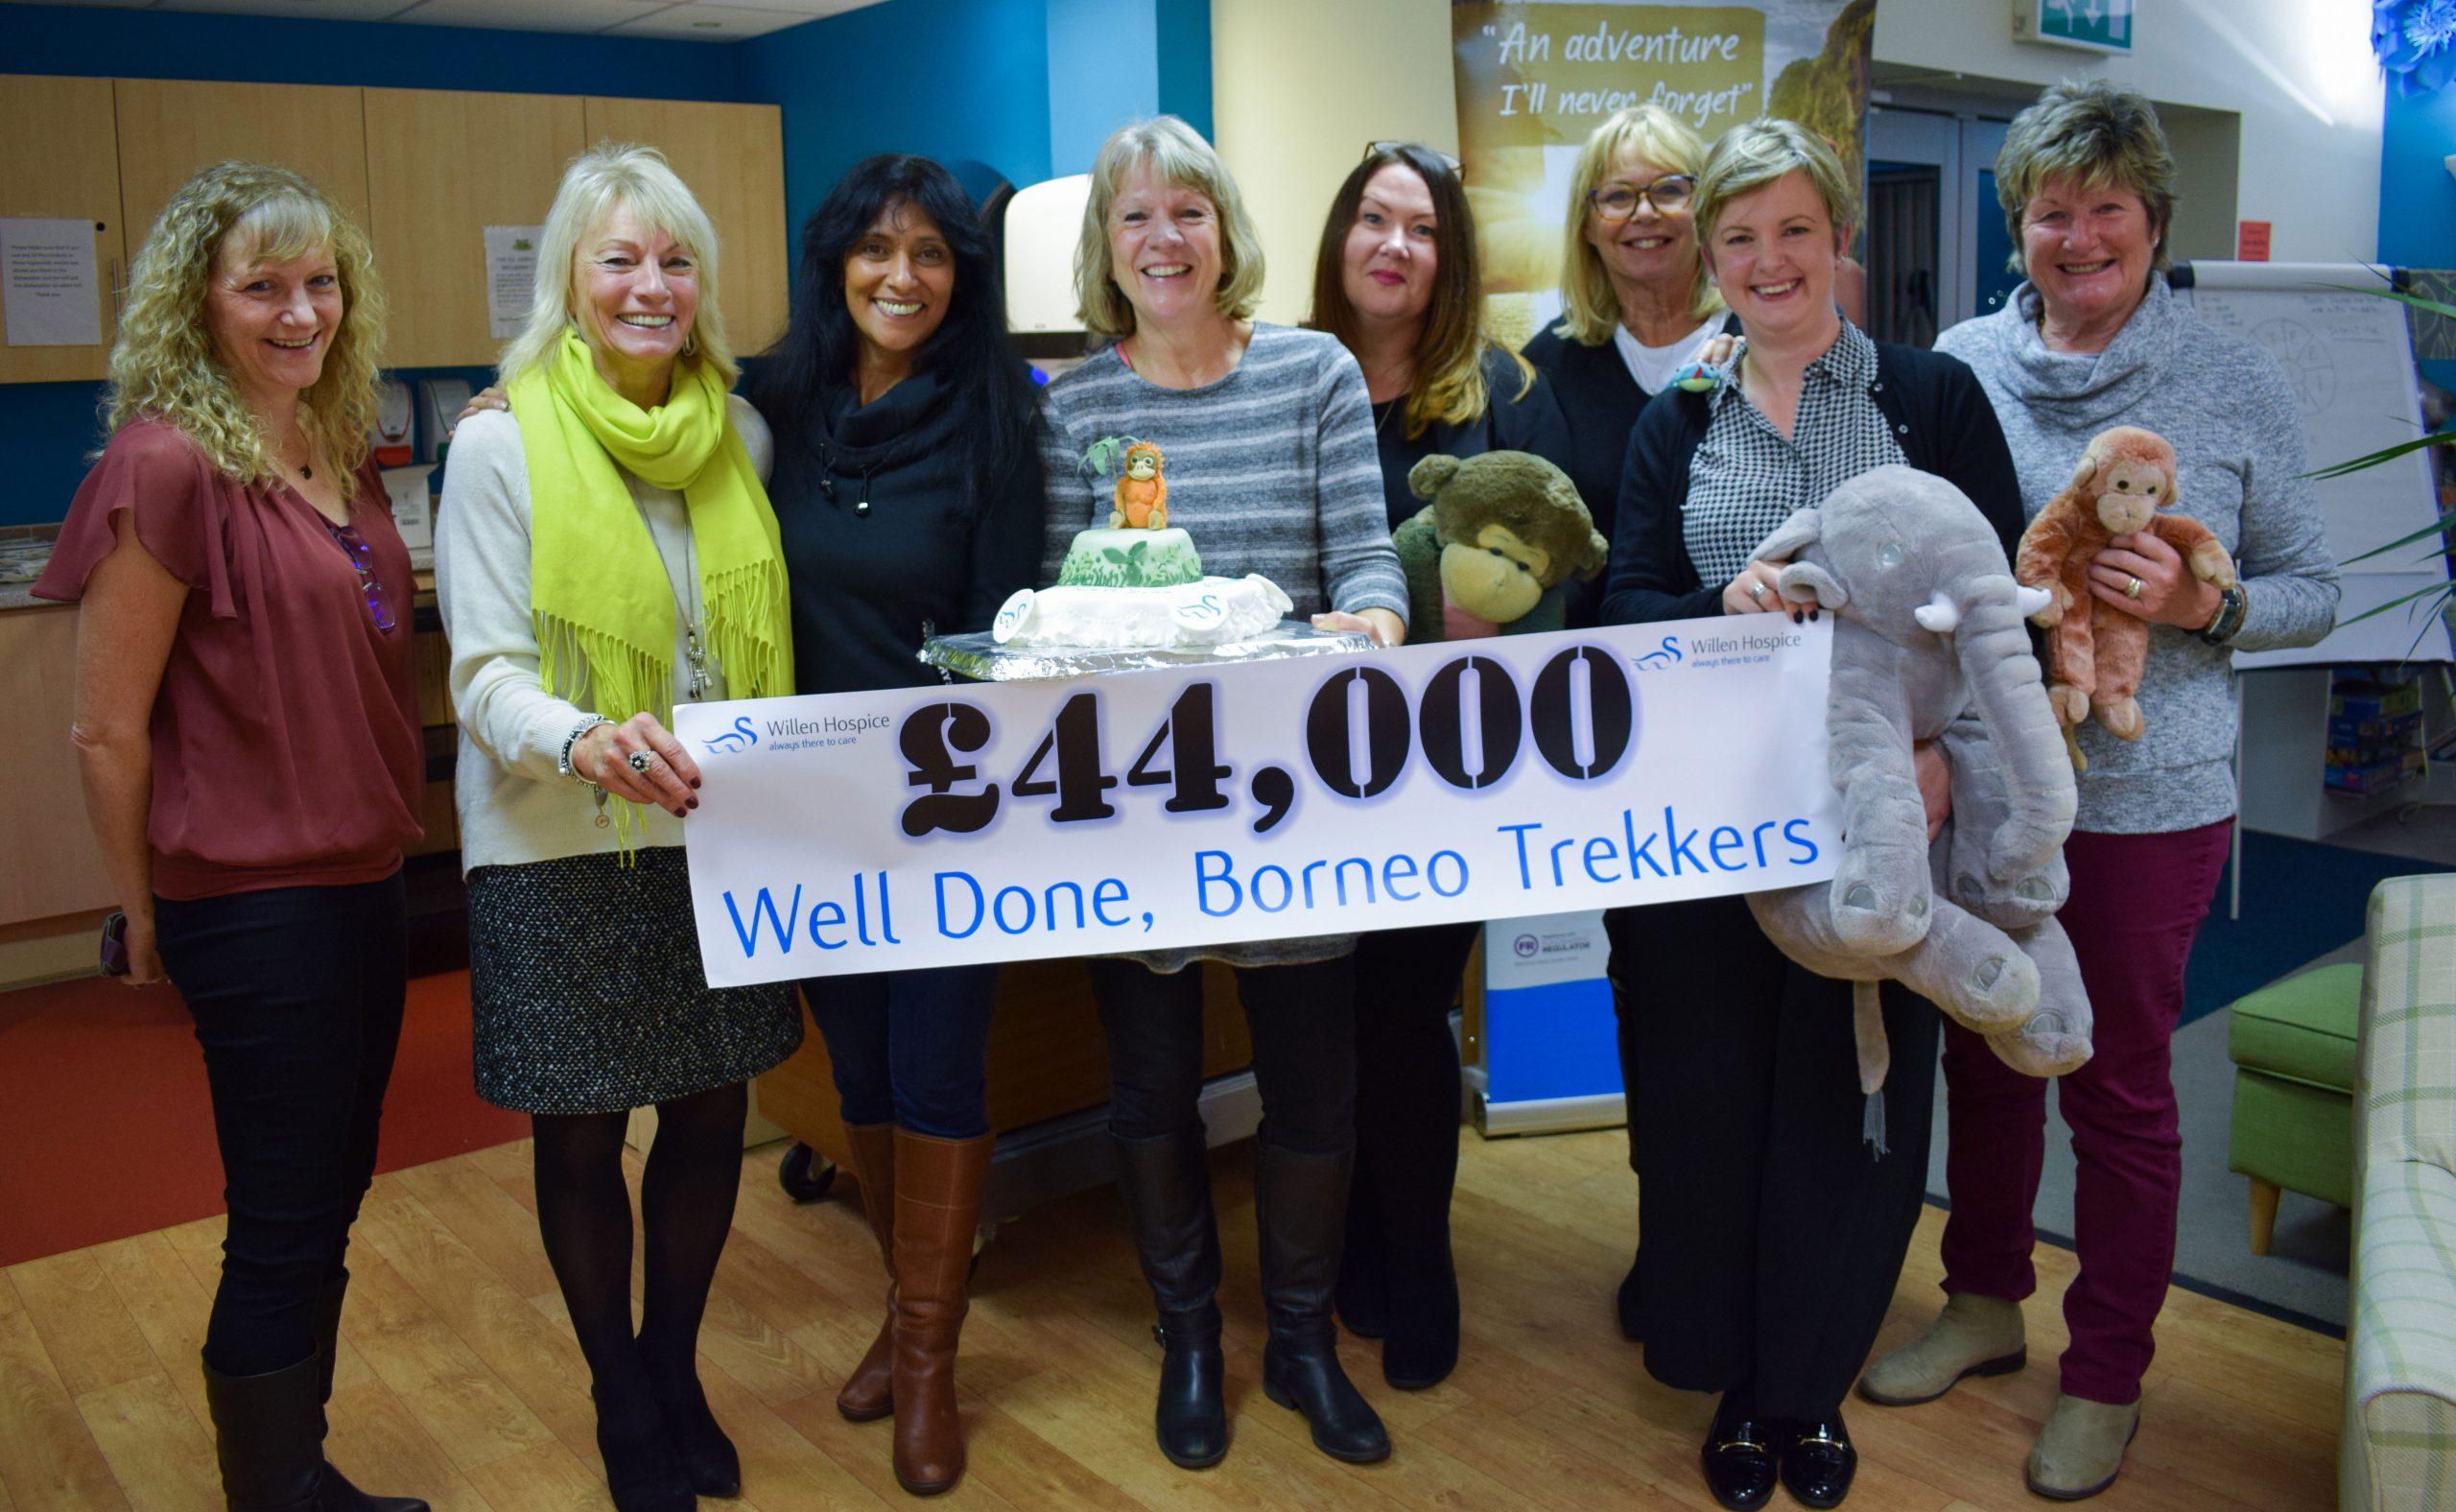 Borneo trekkers raise £44,000 for Willen Hospice